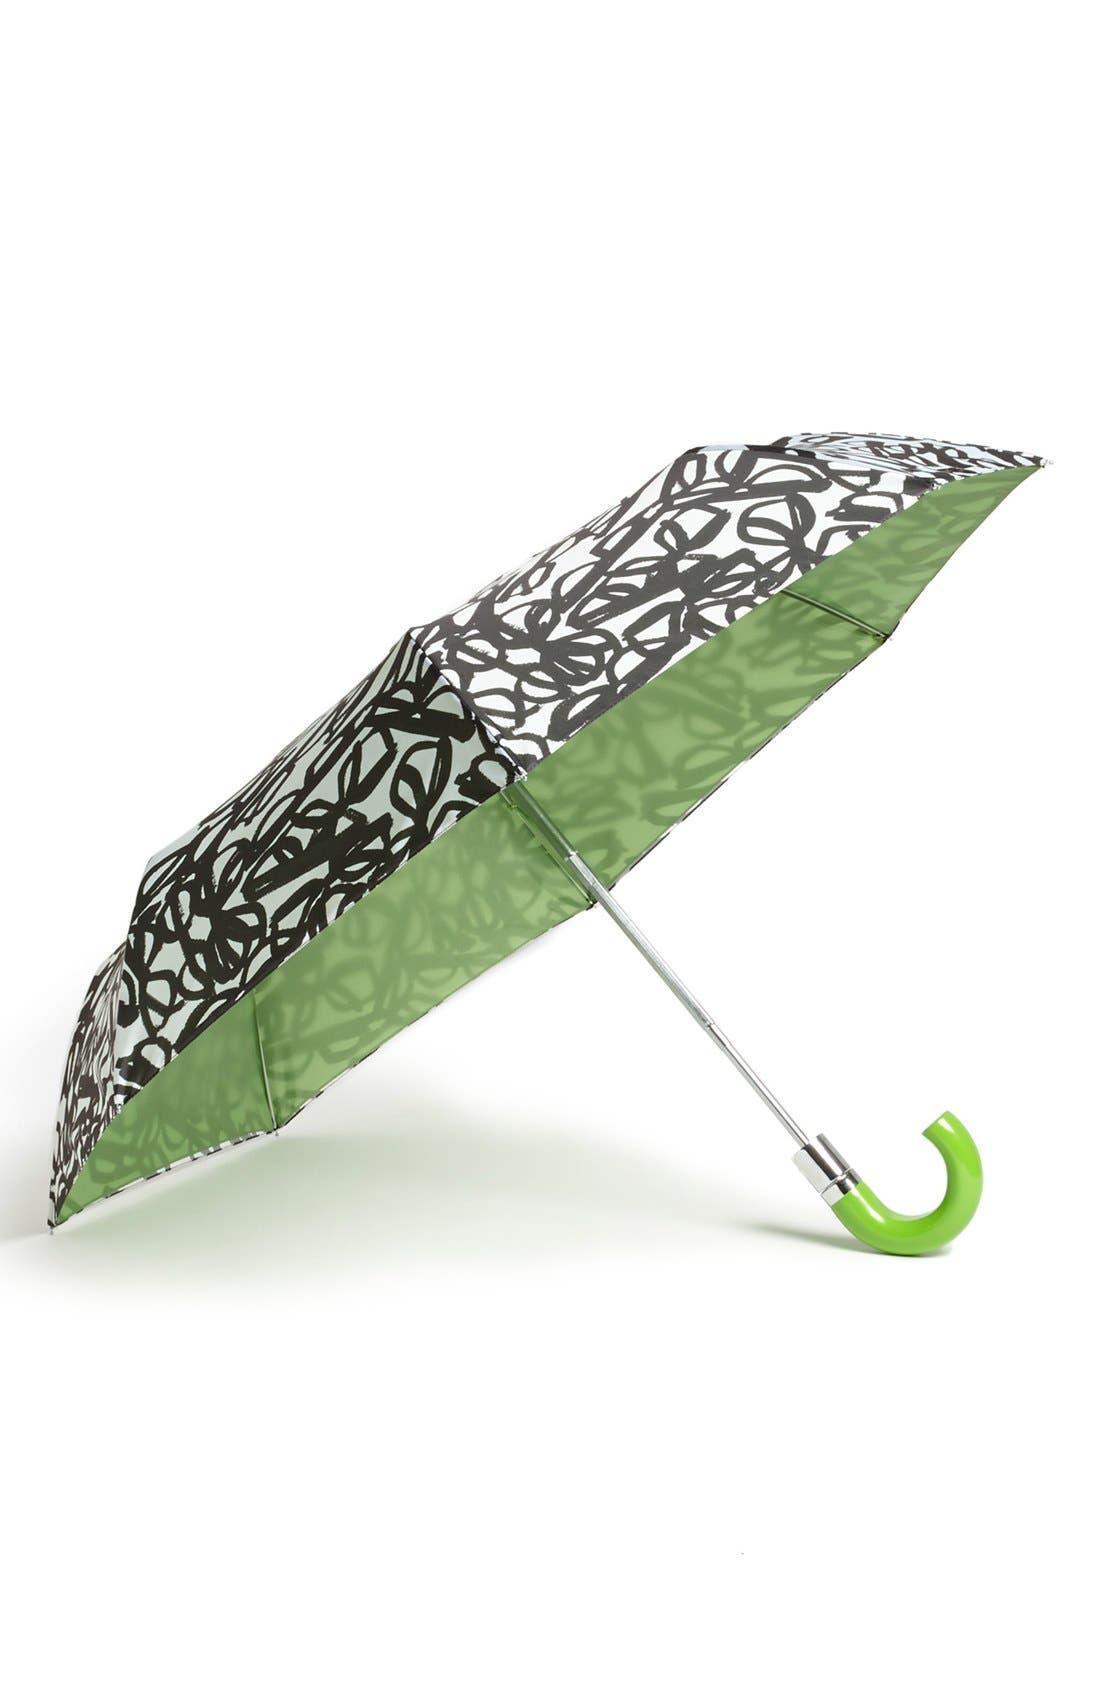 Alternate Image 1 Selected - kate spade new york 'literary glasses' travel umbrella